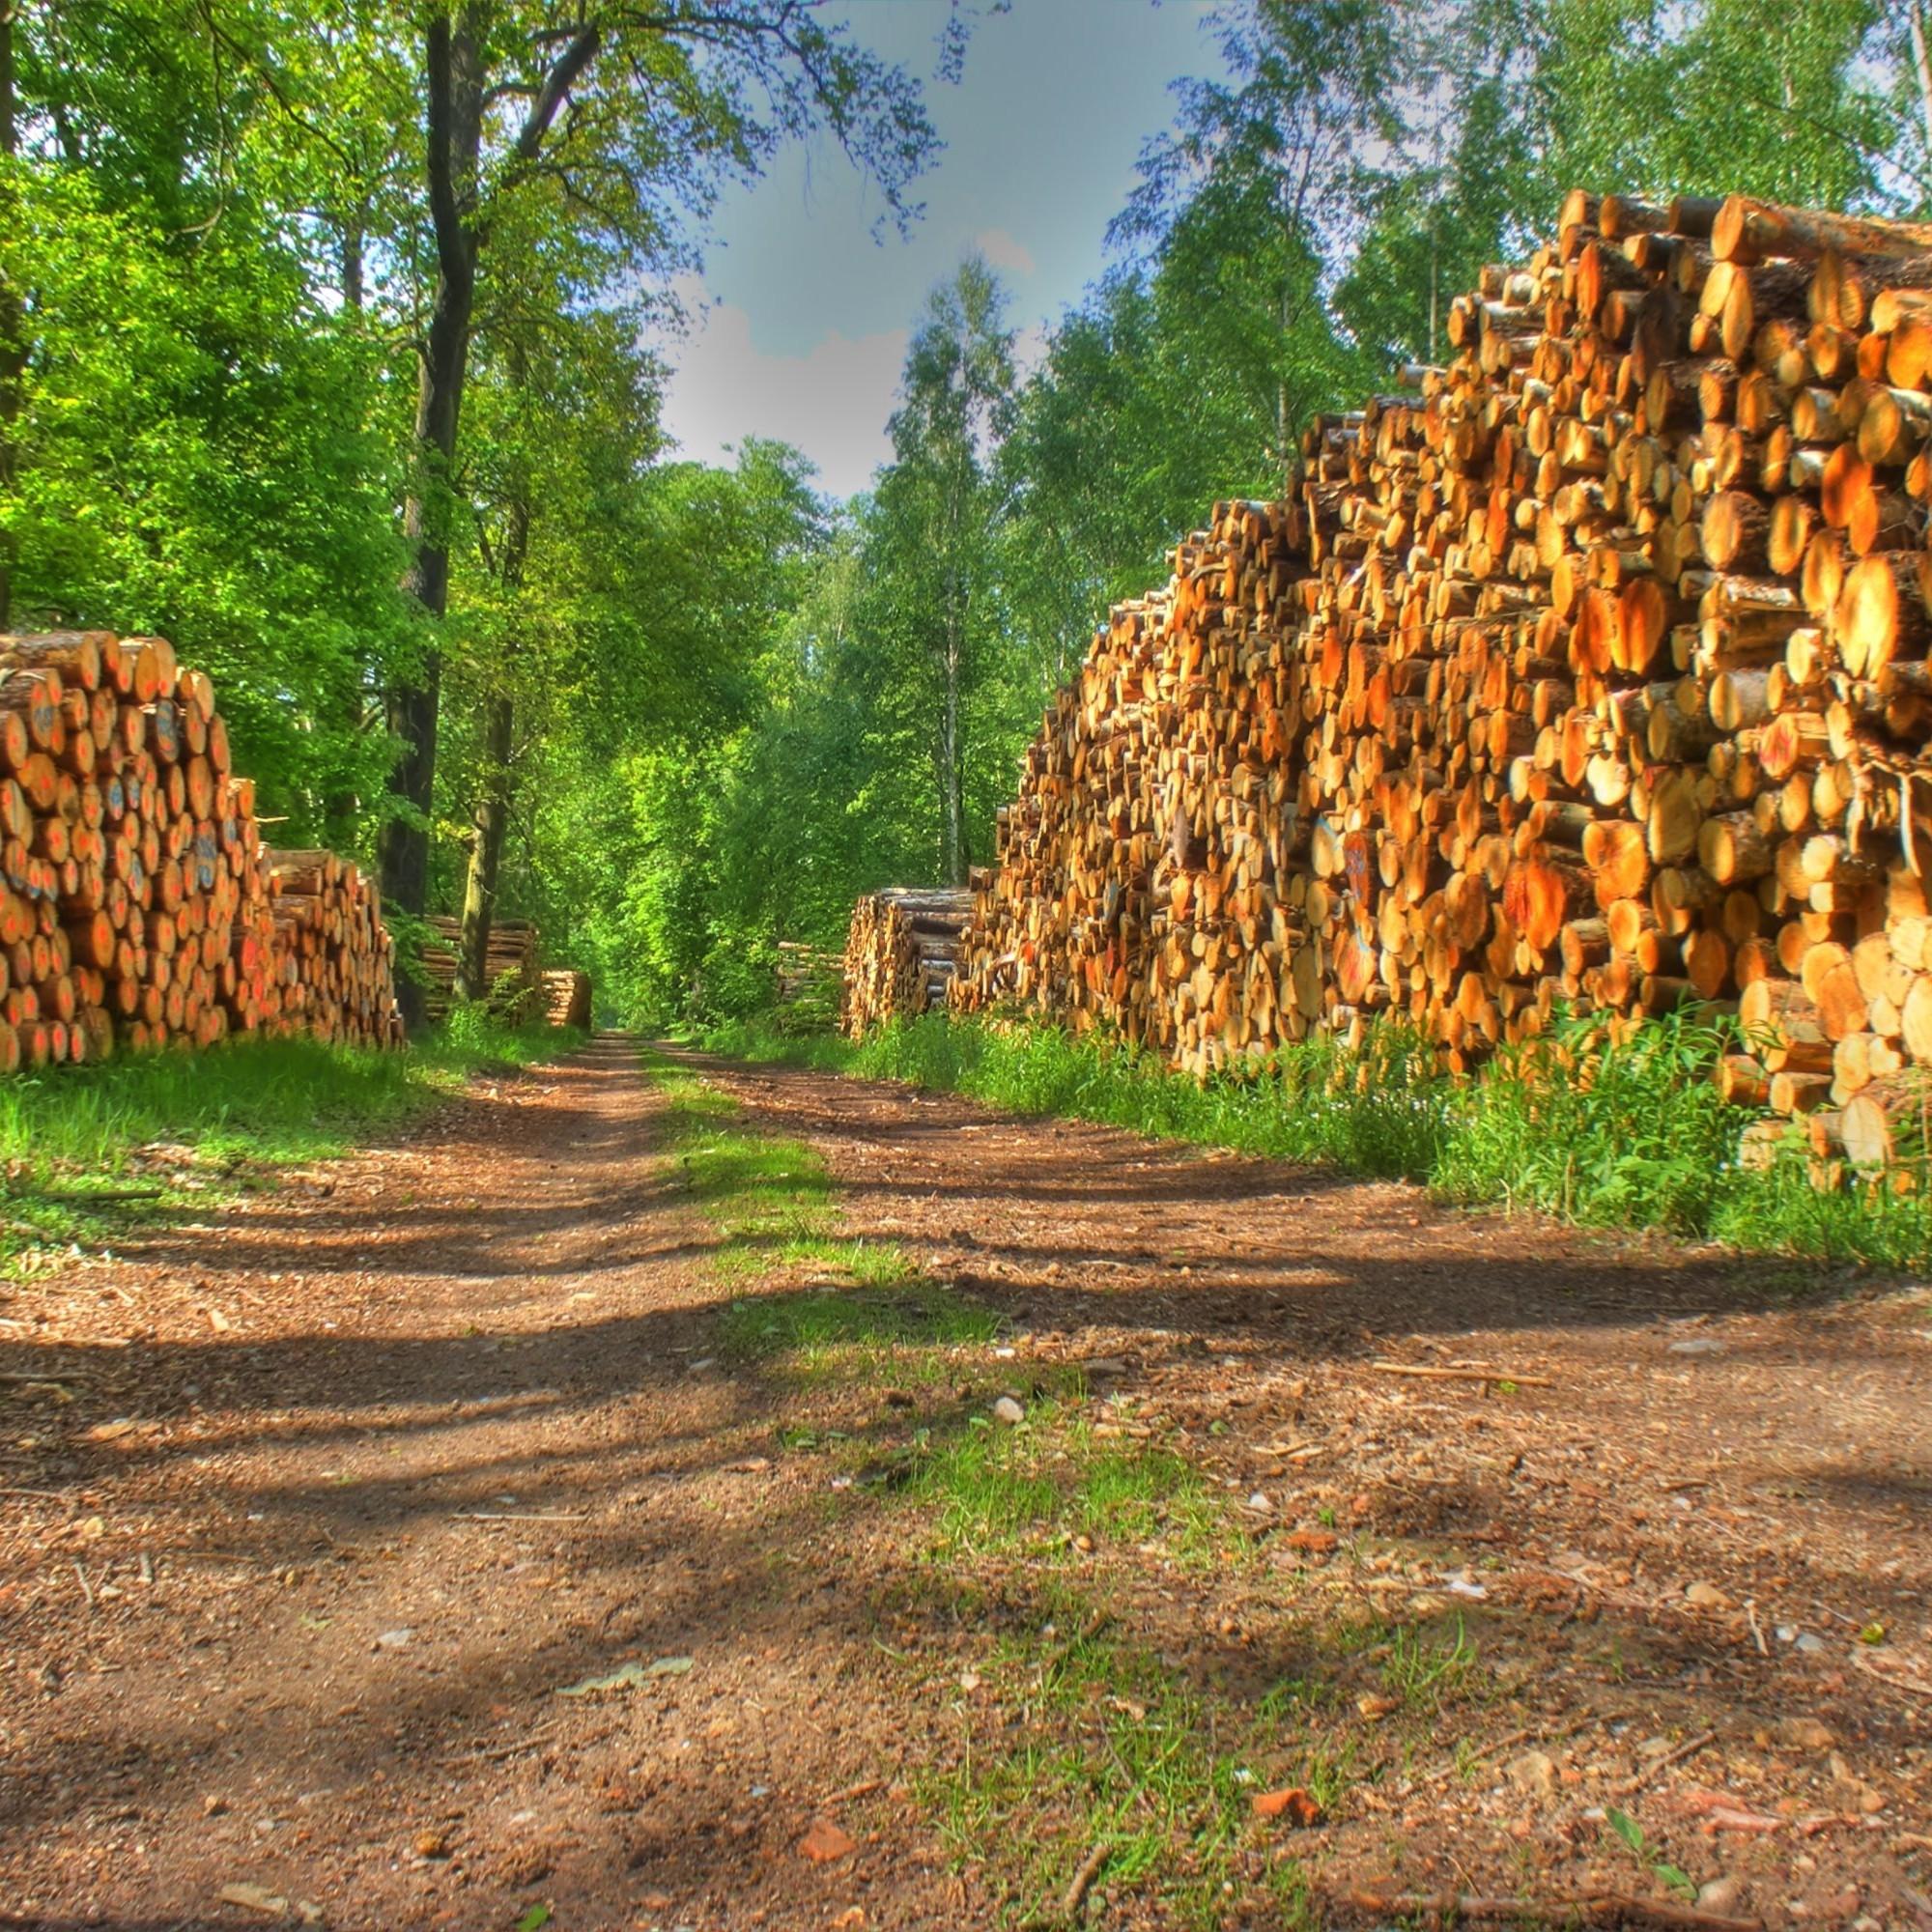 Holzstapel im Wald.